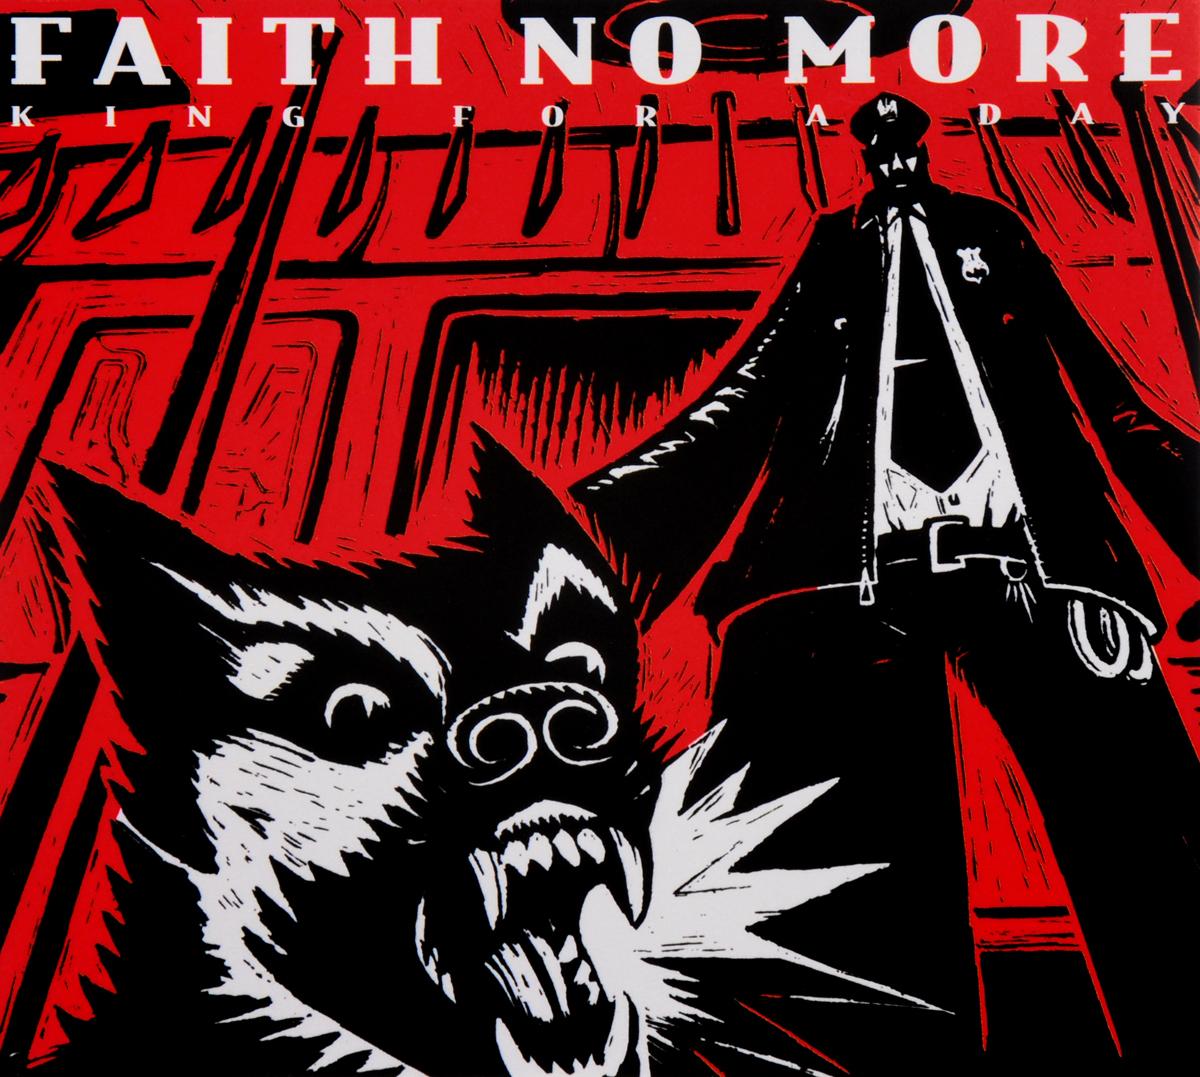 Faith No More Faith No More. King For A Day. Fool For A Lifetime. Deluxe Edition (2 CD) виниловая пластинка faith no more king for a day fool for a lifetime